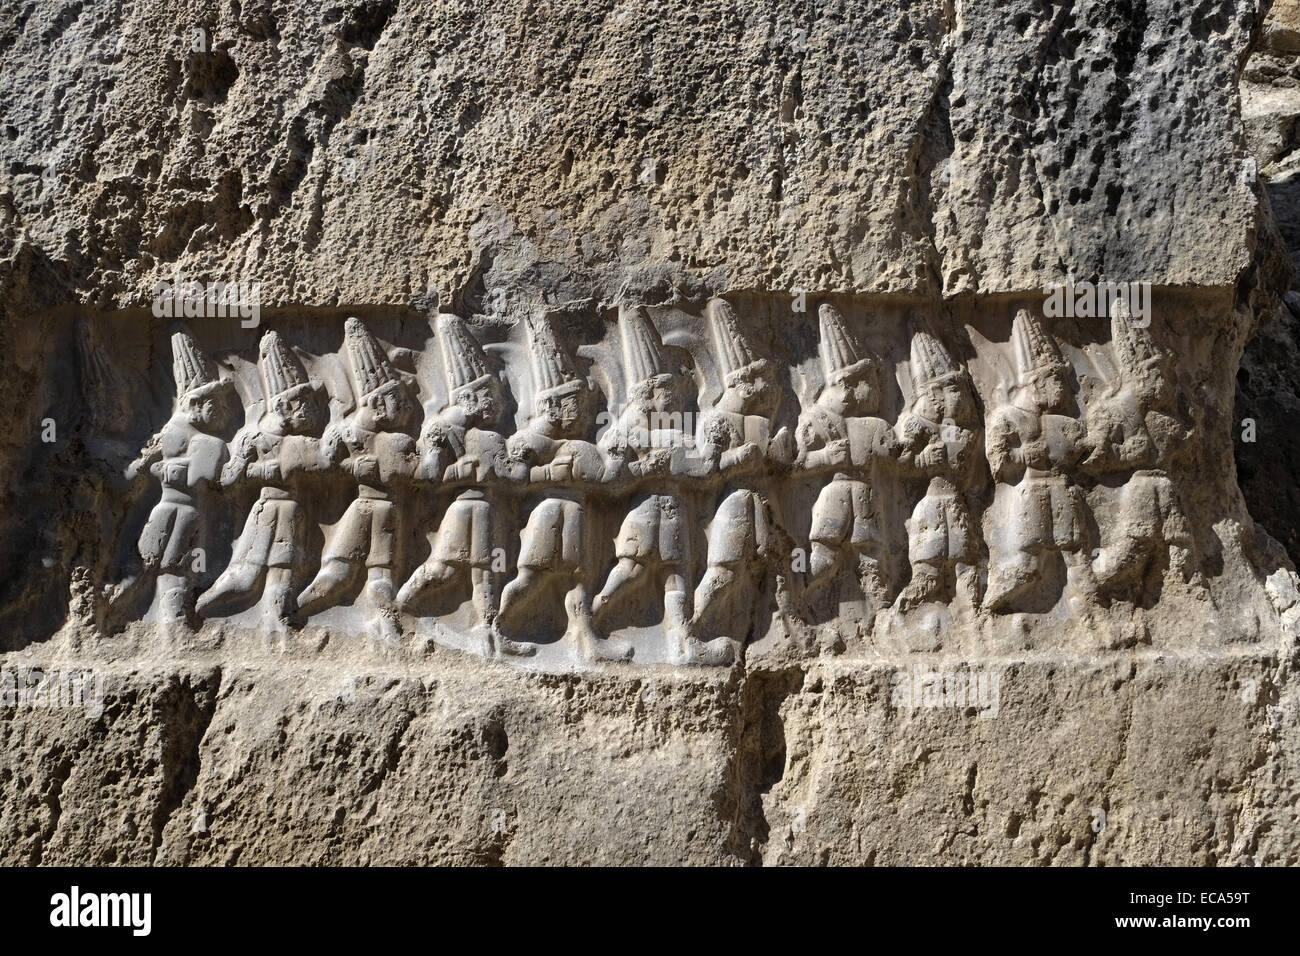 Relief of the 12 gods, Yazilikaya, sanctuary of the Hittites in Bogazkale, Çorum Province, Turkey Stock Photo